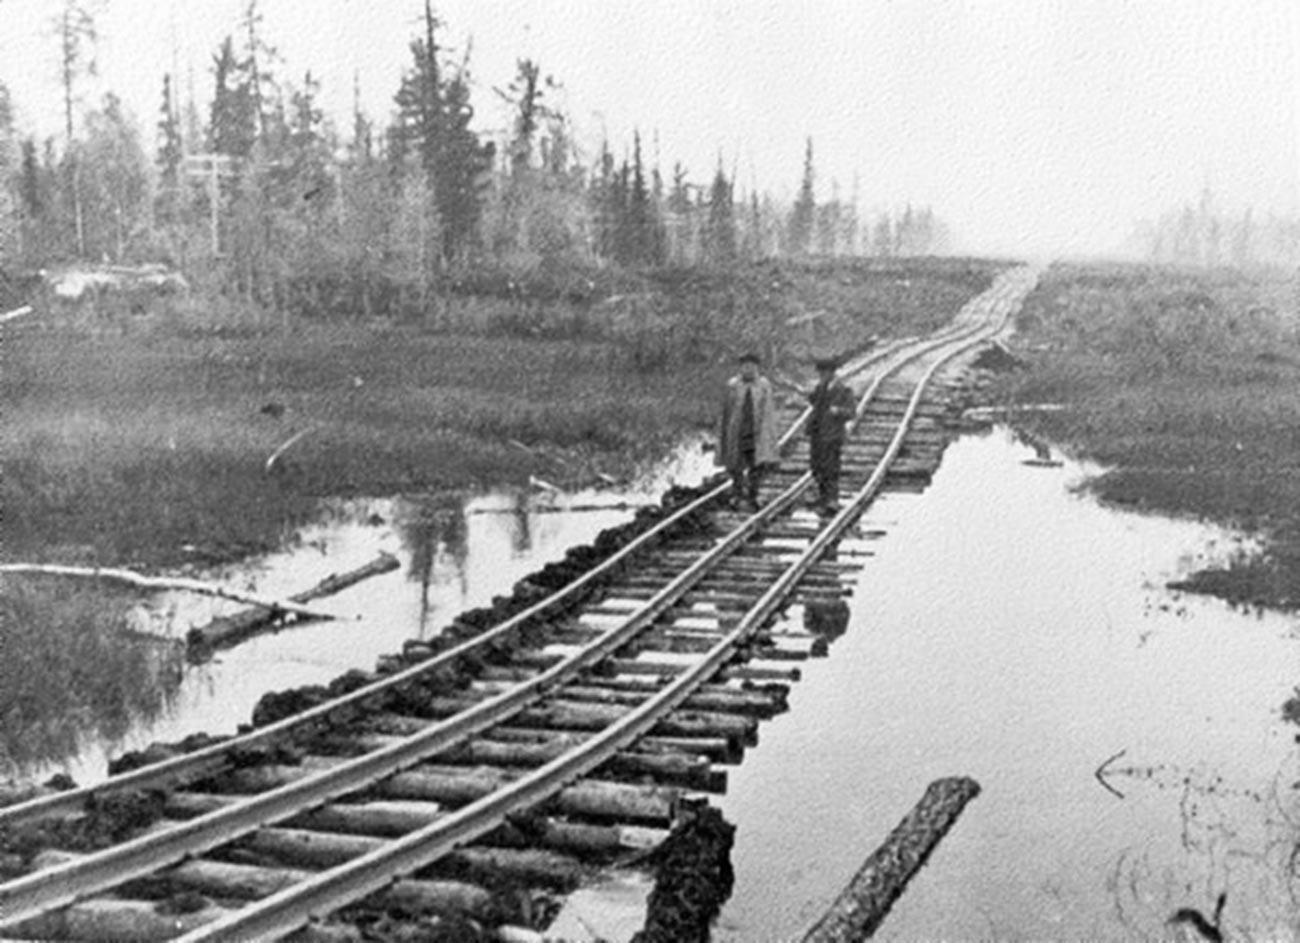 北極圏横断鉄道の建設